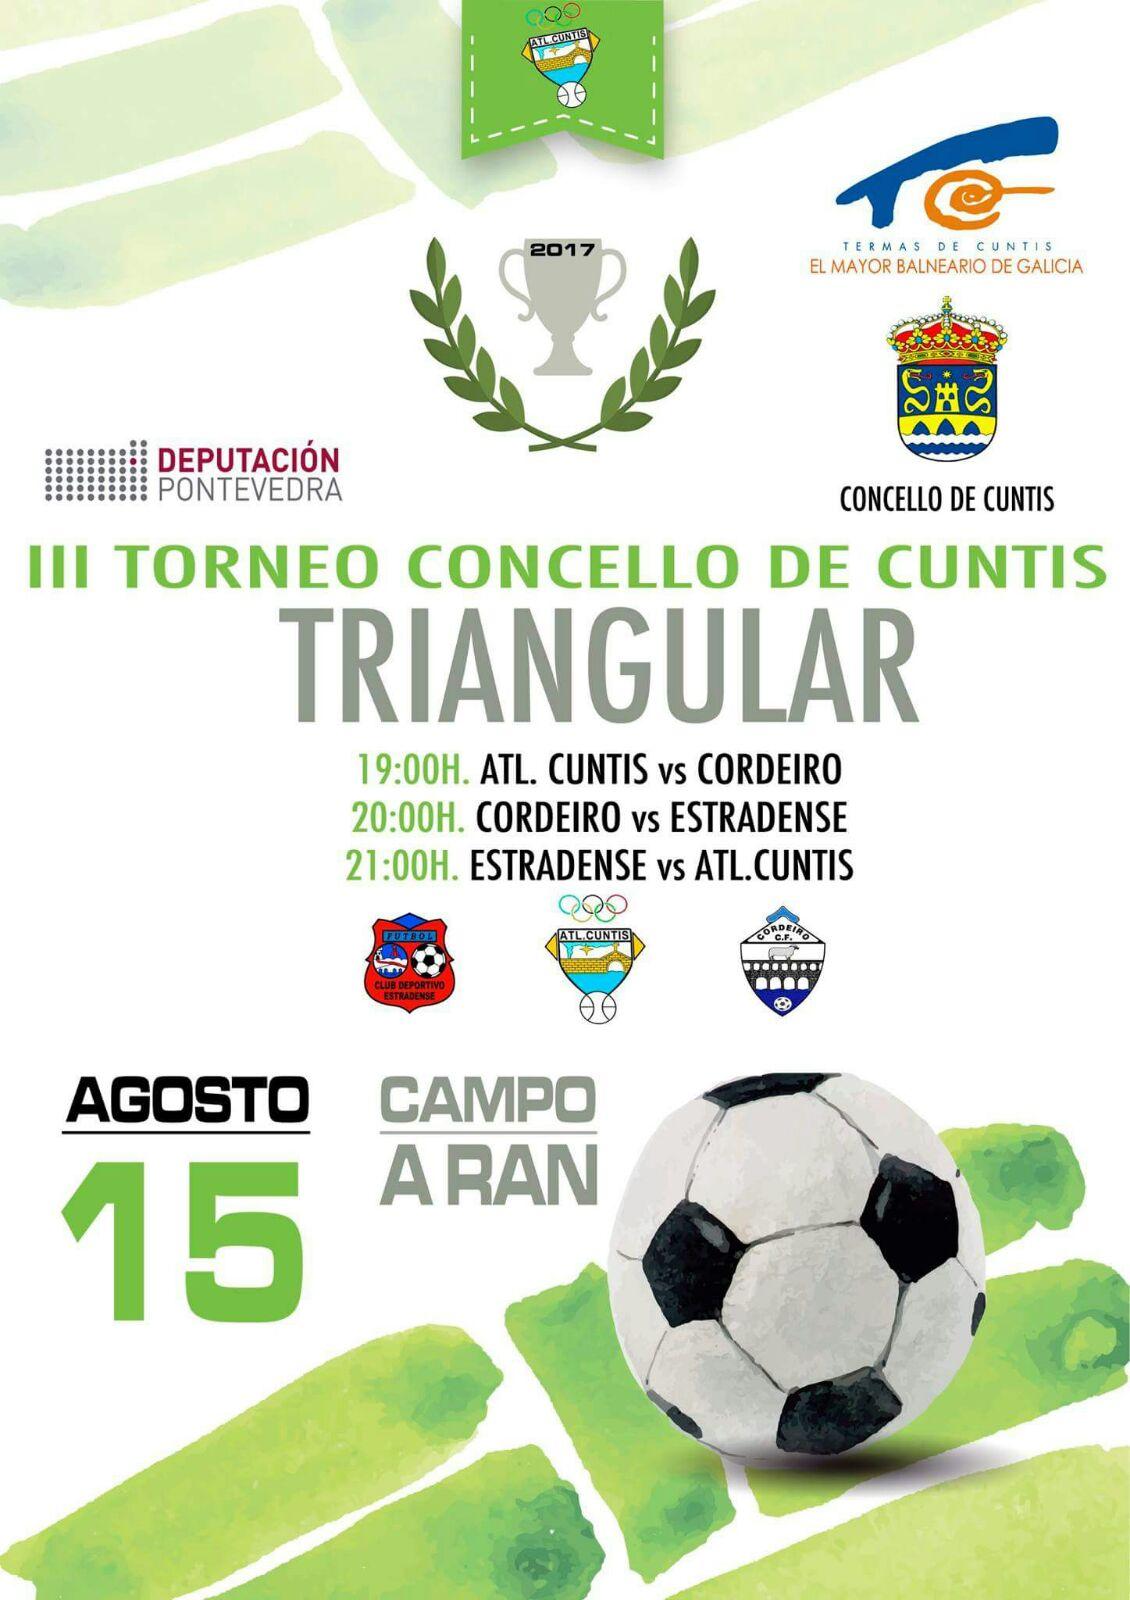 III Torneo concello Cuntis